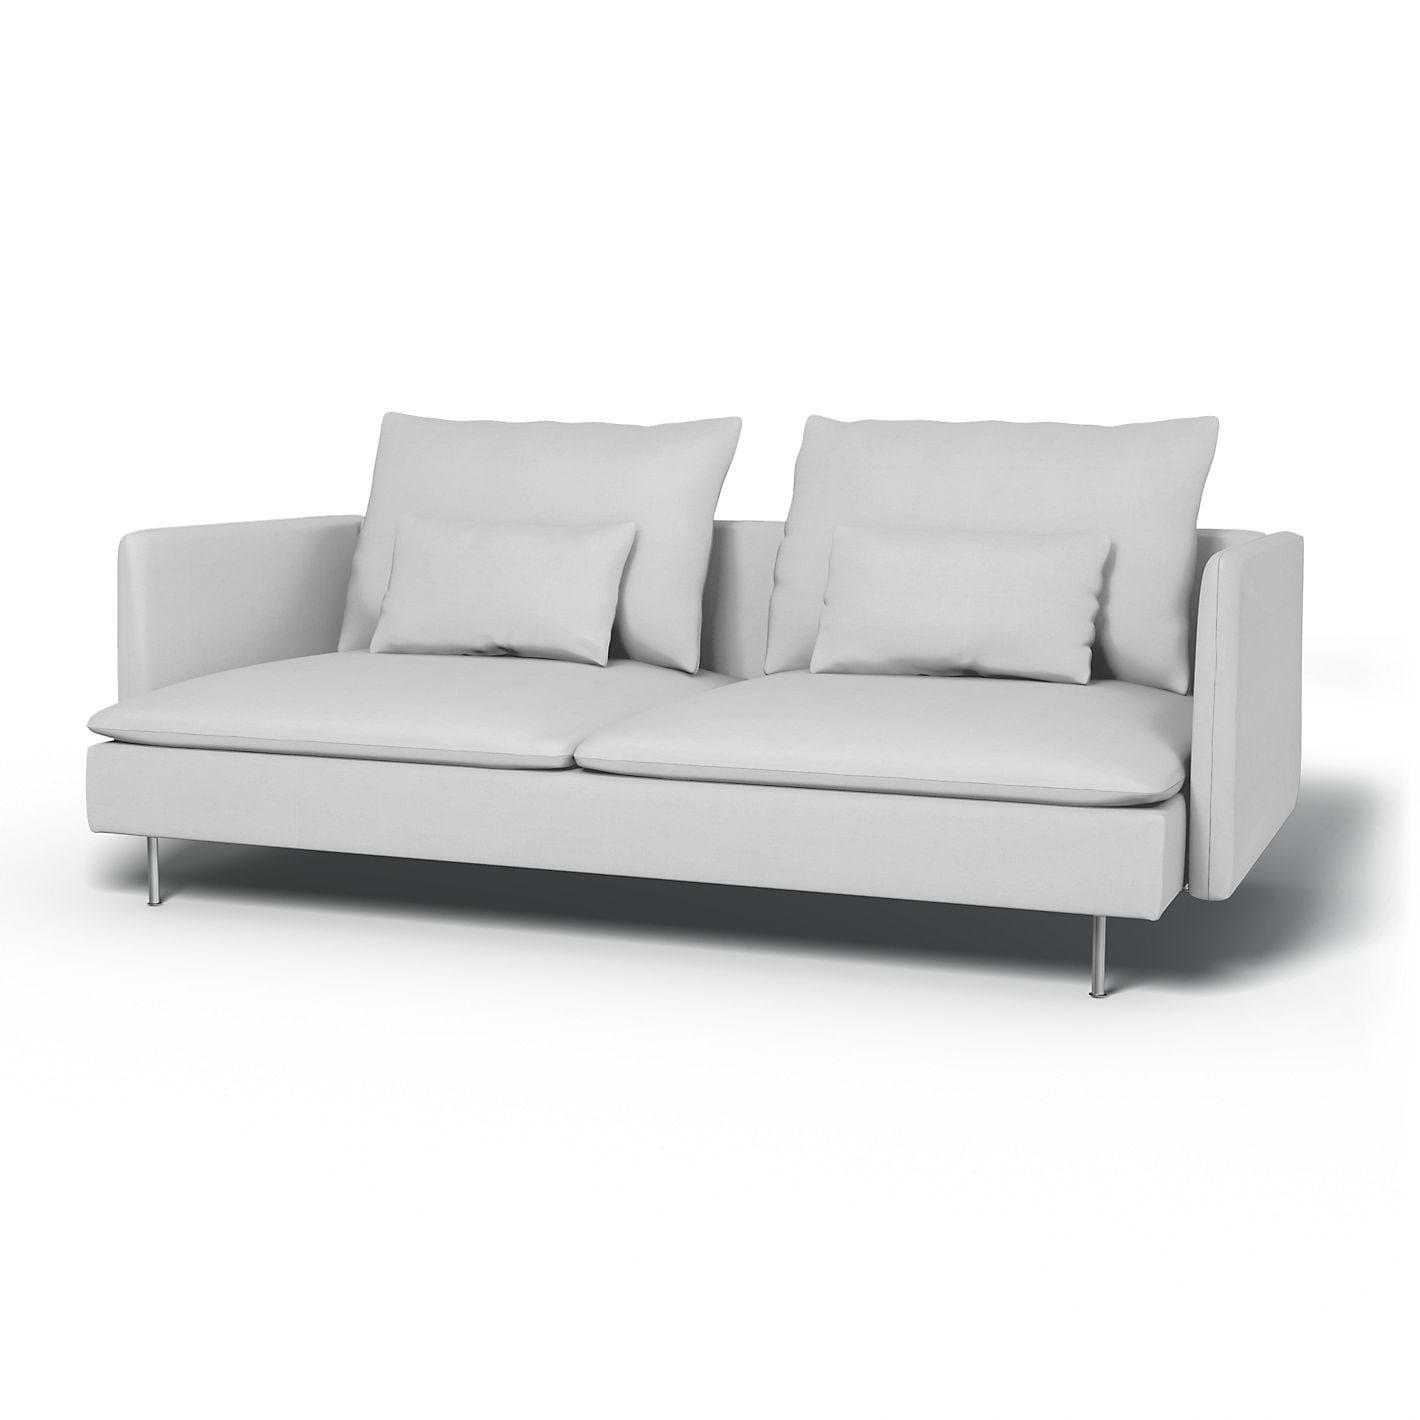 Shop Original High Quality High Design Extra Replacement Ikea Soderhamn Sofa Covers For The Soderhamn Couch Series Including Sofa 3 Seater Sofa Sofa Covers